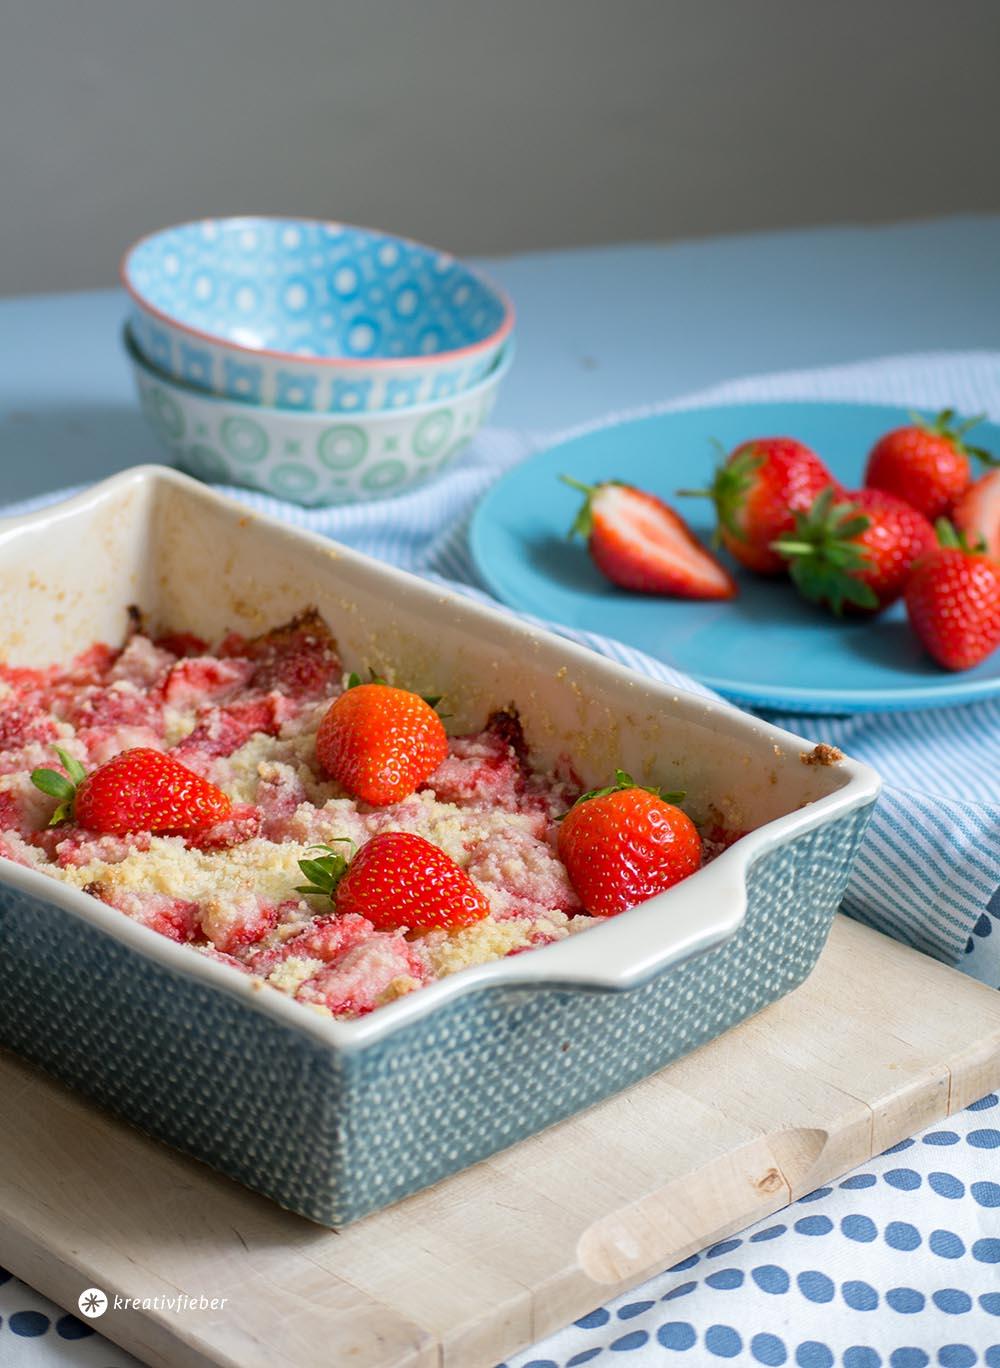 Erbeercrumble strawberry crumble mit Eis